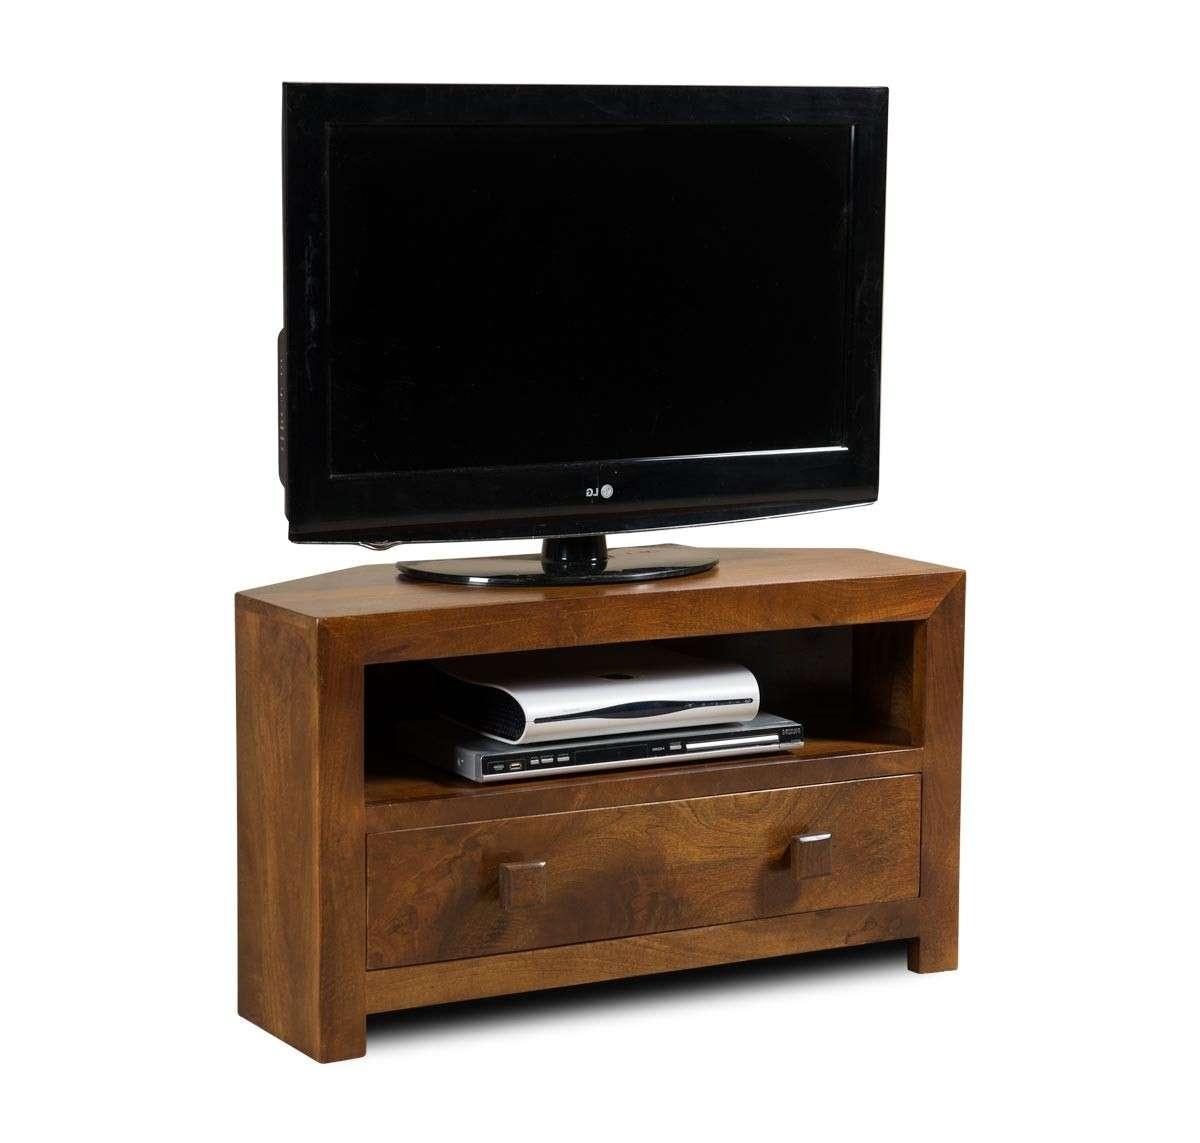 Dakota Mango Small Corner Tv Stand | Casa Bella Furniture Uk Throughout Small Corner Tv Stands (View 8 of 20)